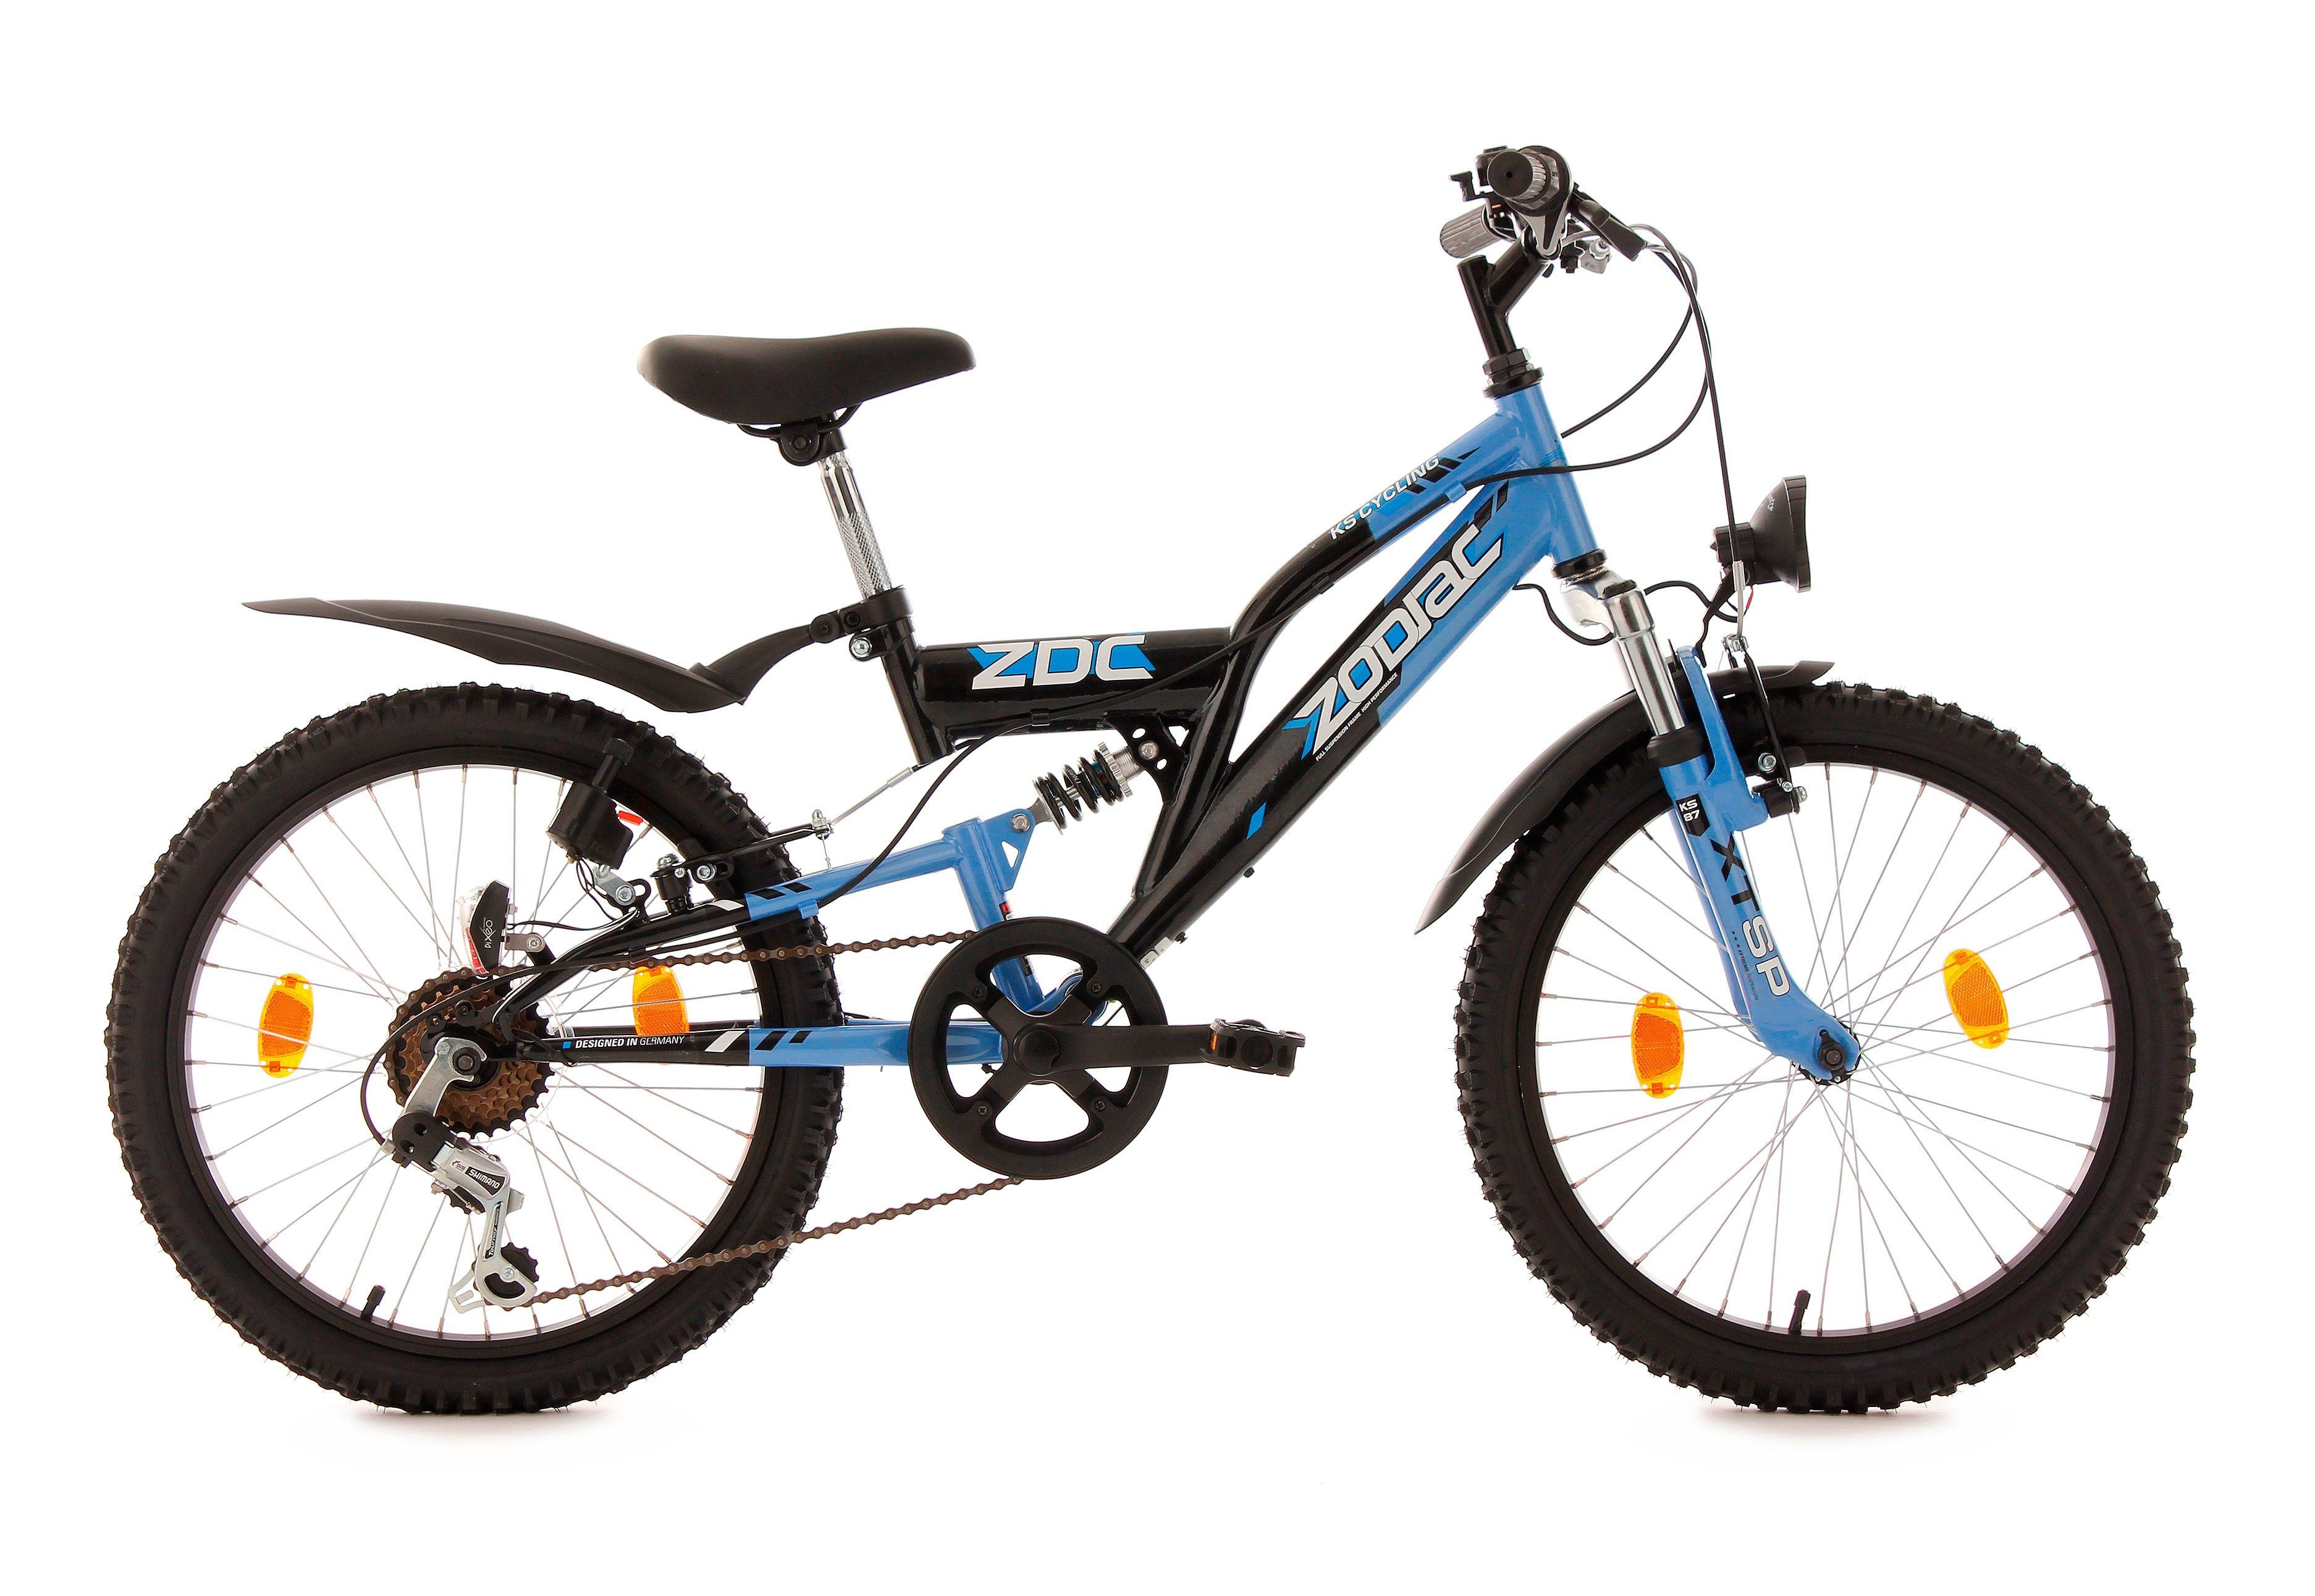 Fully Jugend-Mountainbike, 20 Zoll, blau-schwarz, 6-Gang-Kettenschaltung, »Zodiac«, KS Cycling